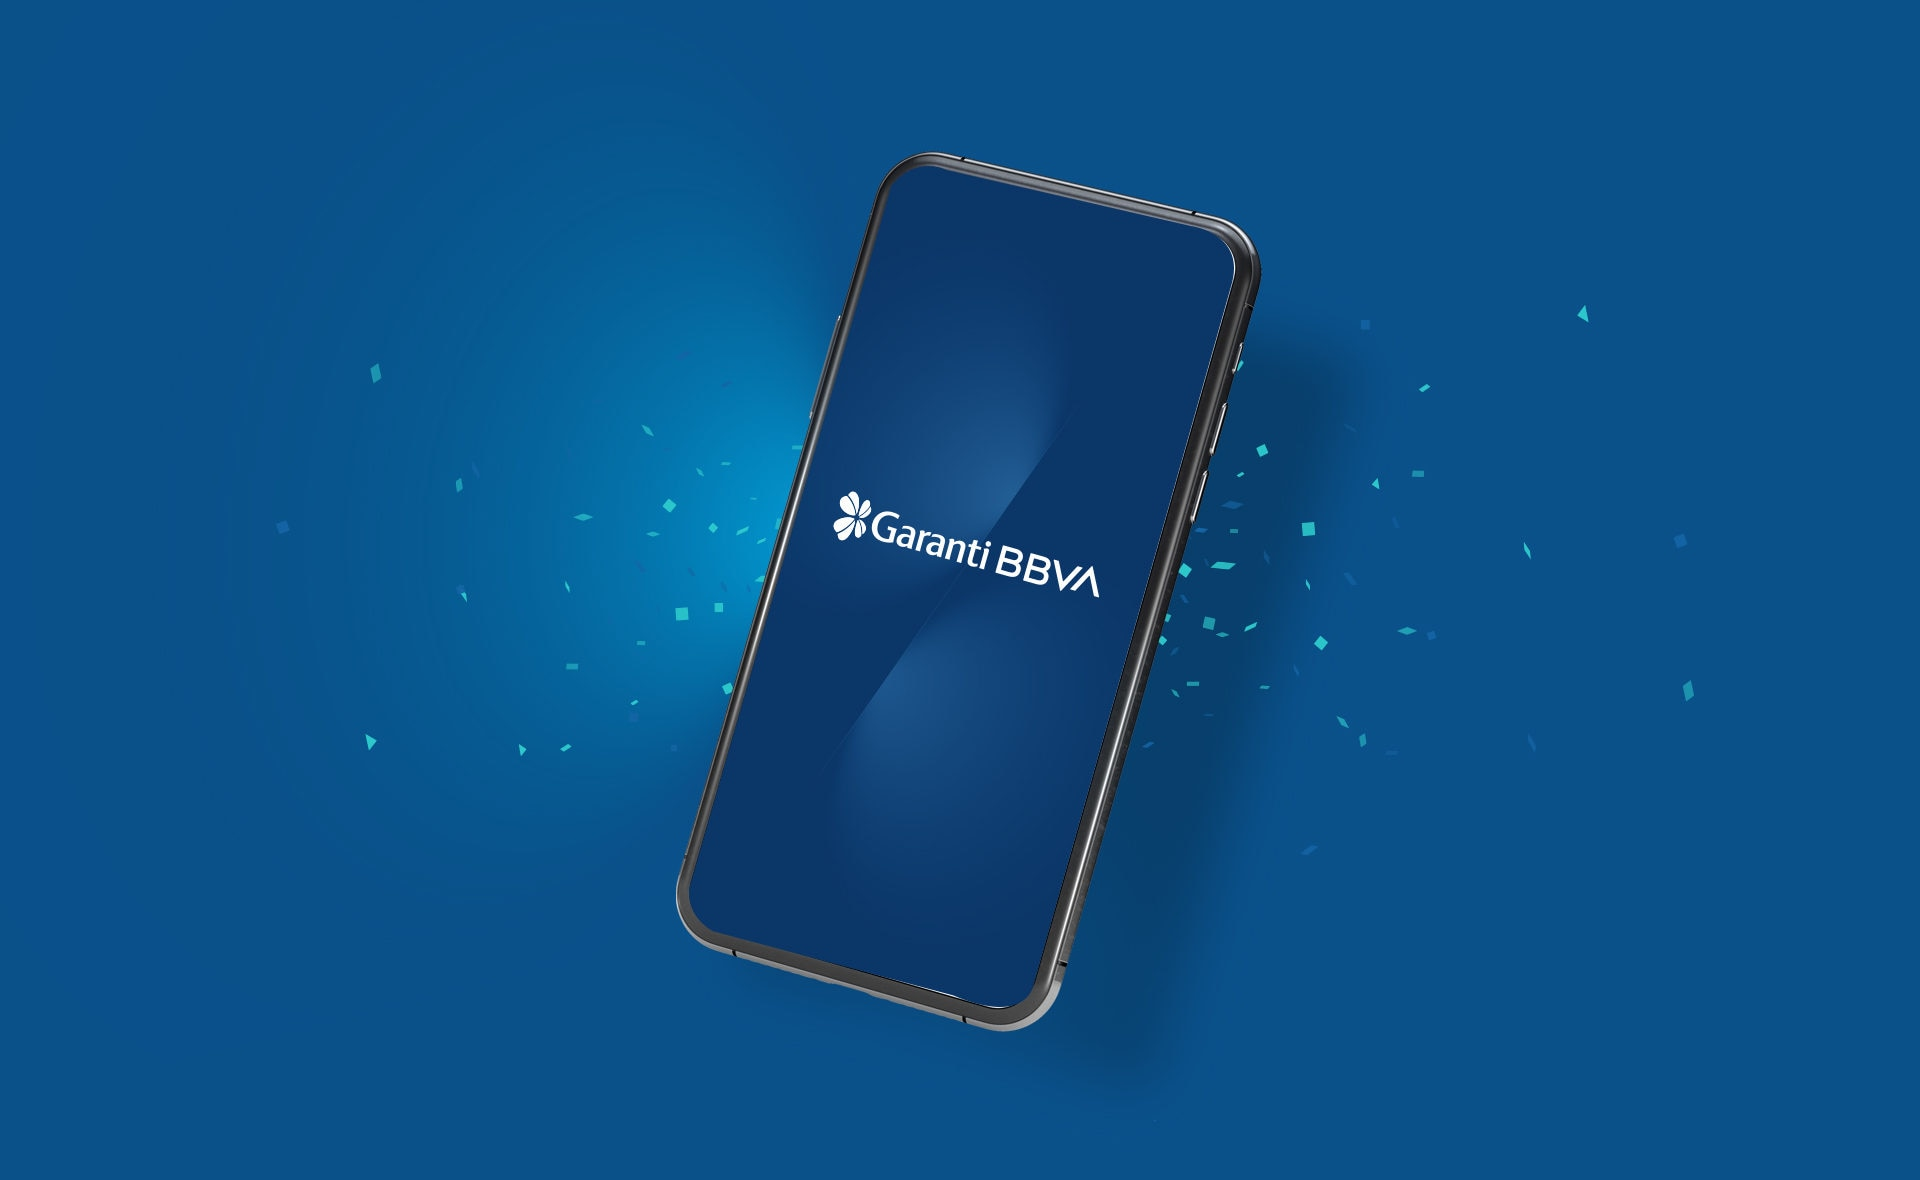 bbva-hitos-digitales-turquia-GARANTI-premio-app